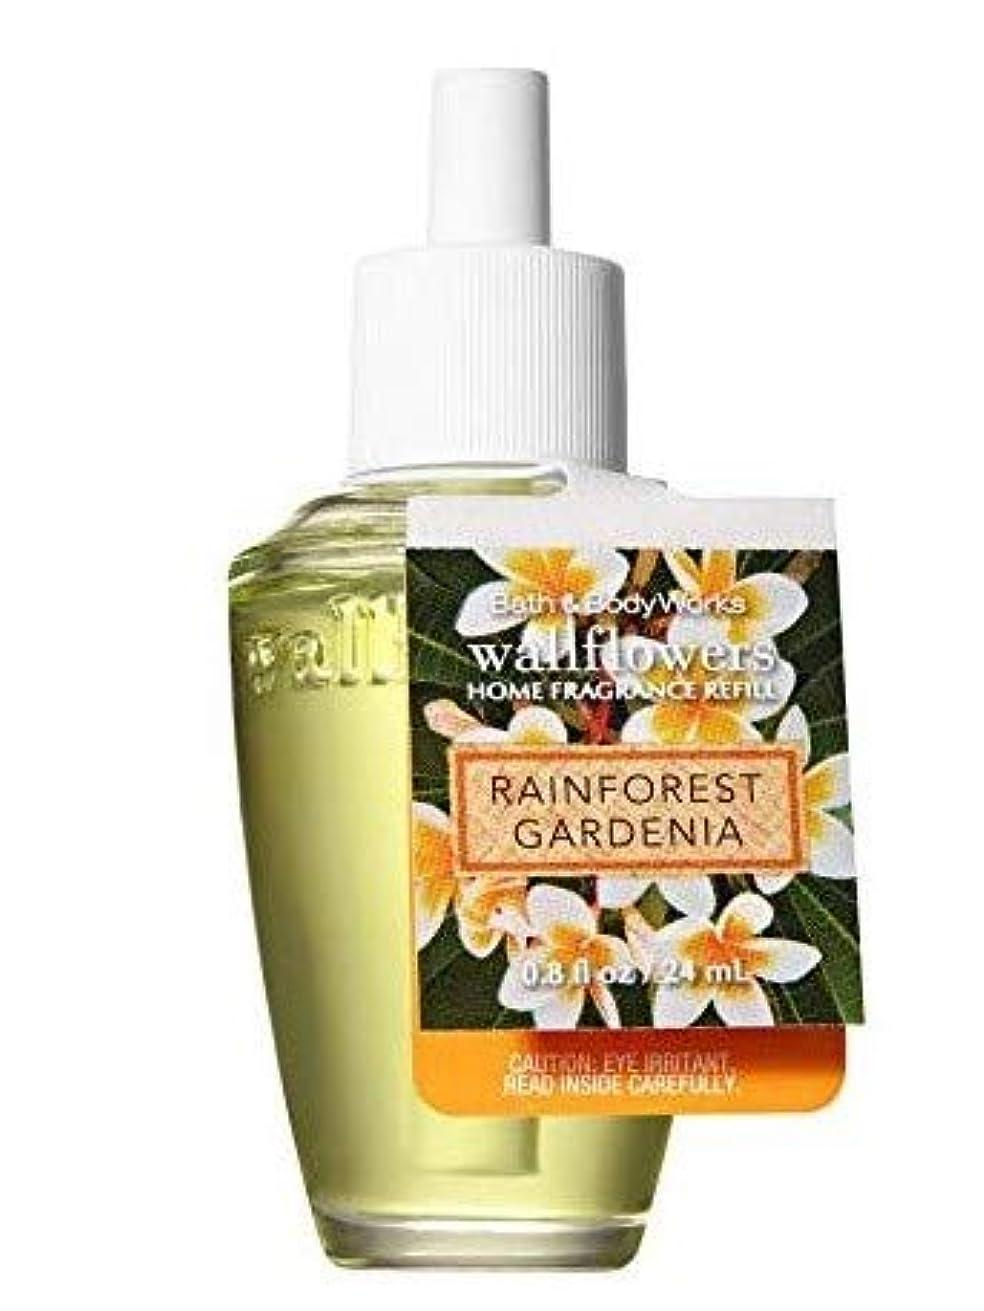 【Bath&Body Works/バス&ボディワークス】 ルームフレグランス 詰替えリフィル レインフォレストガーデニア Wallflowers Home Fragrance Refill Rainforest Gardenia [並行輸入品]